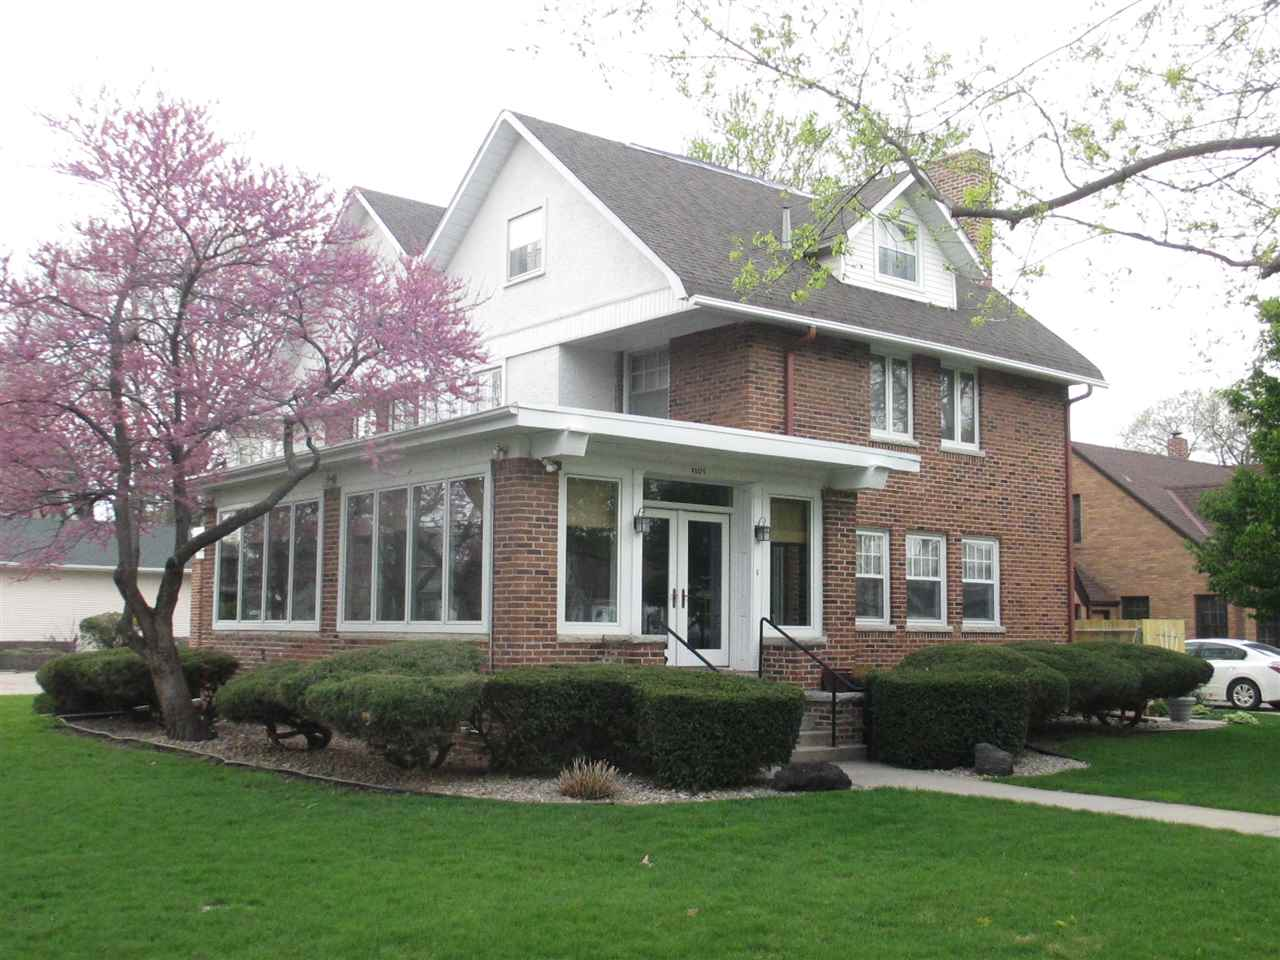 Real Estate for Sale, ListingId: 32969544, Hastings,NE68901